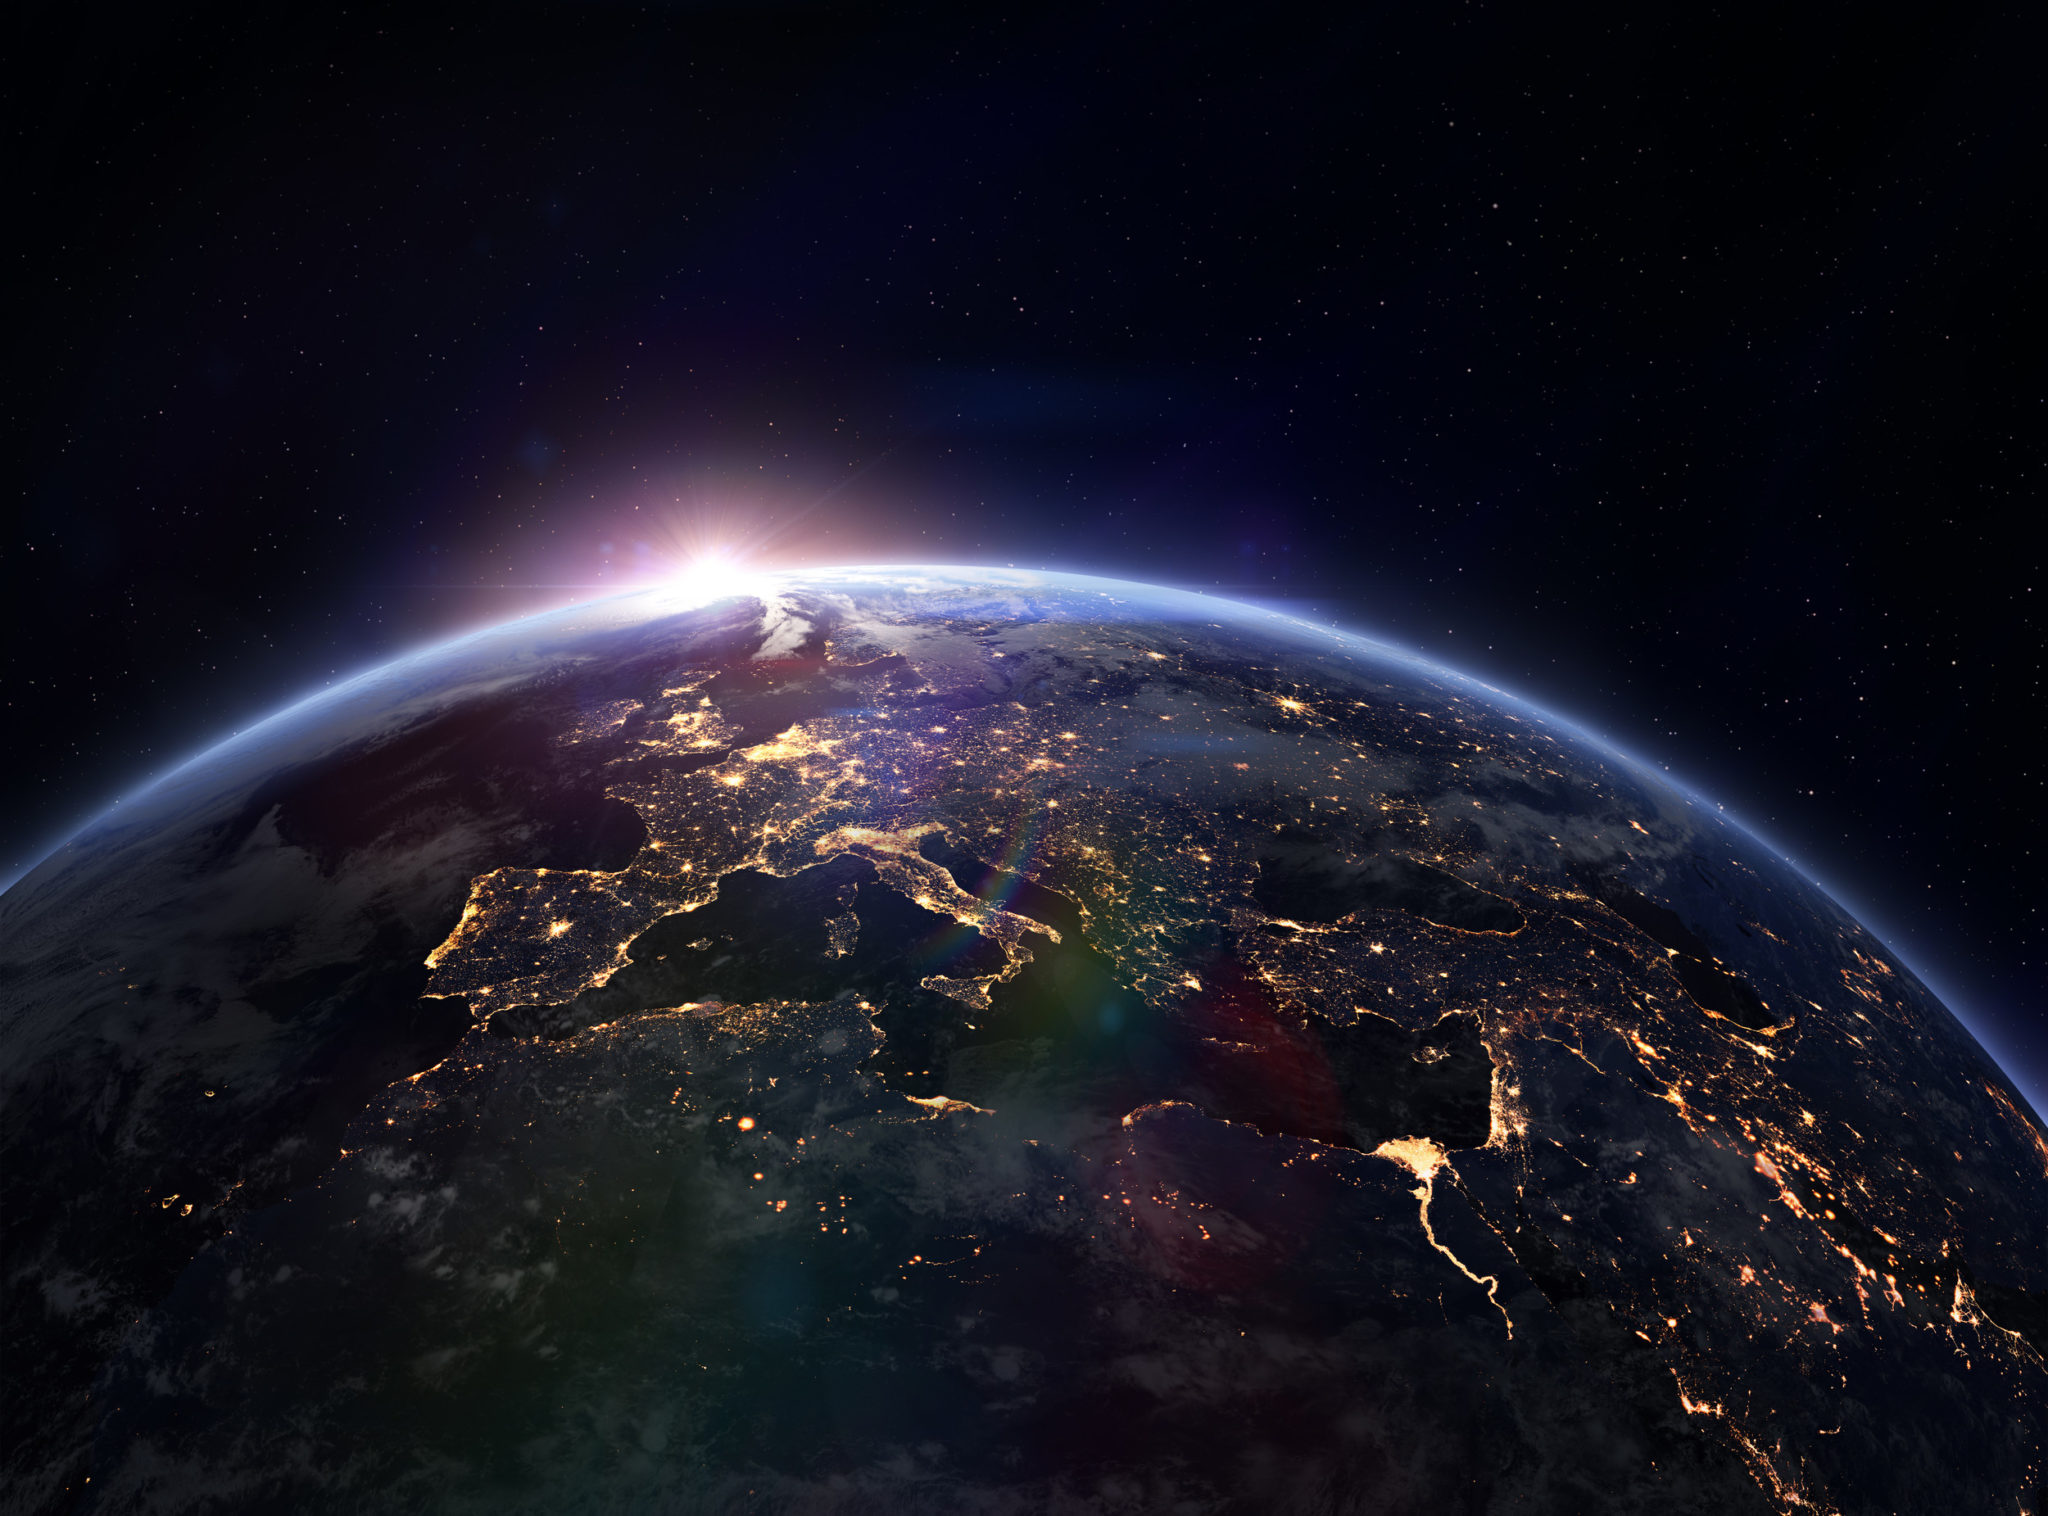 SDA's Kennedy: Cislunar Space The Next Military Frontier